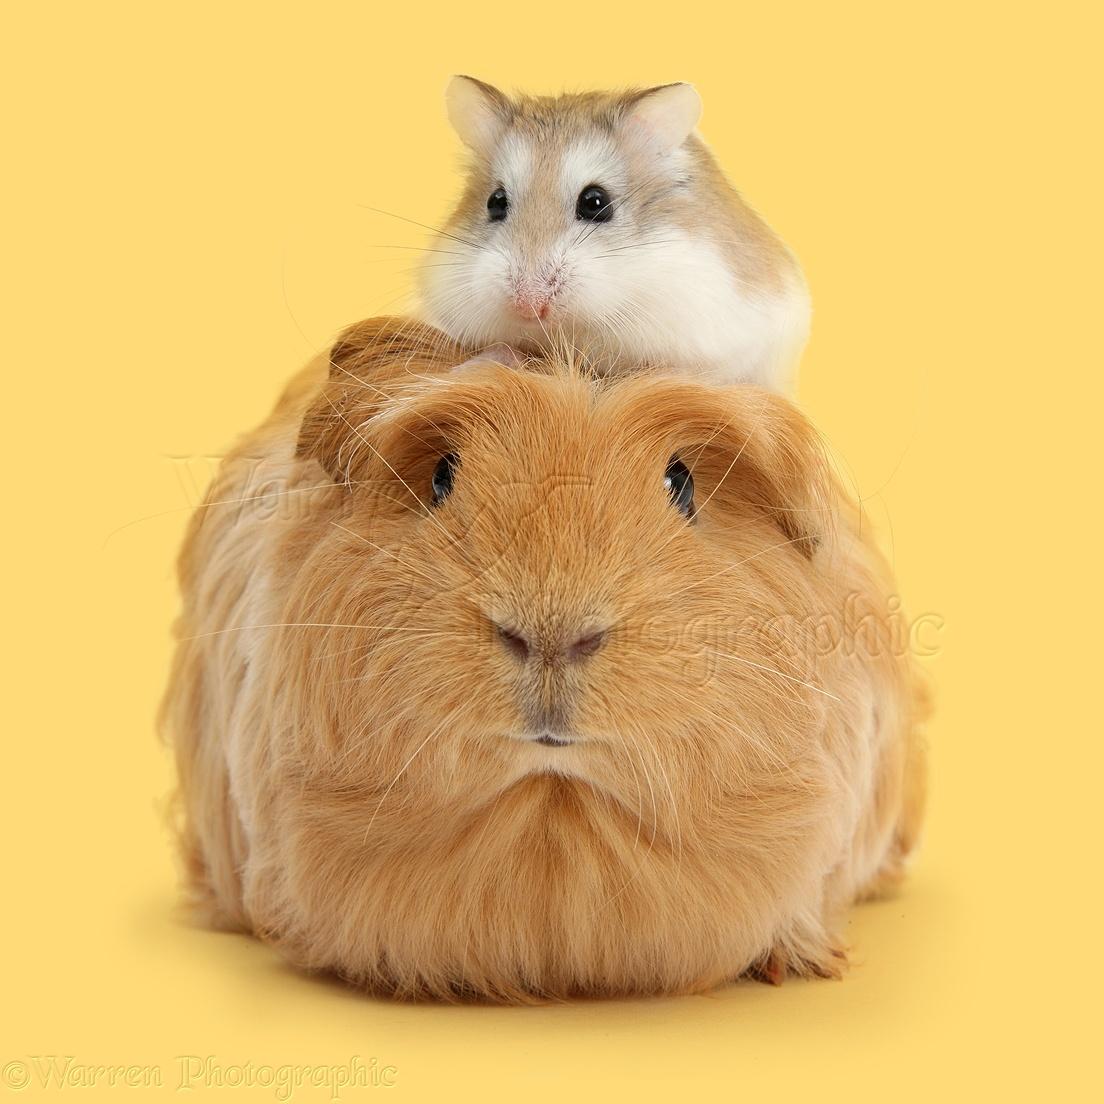 Roborovski hamster images by Warren Photographic, p1